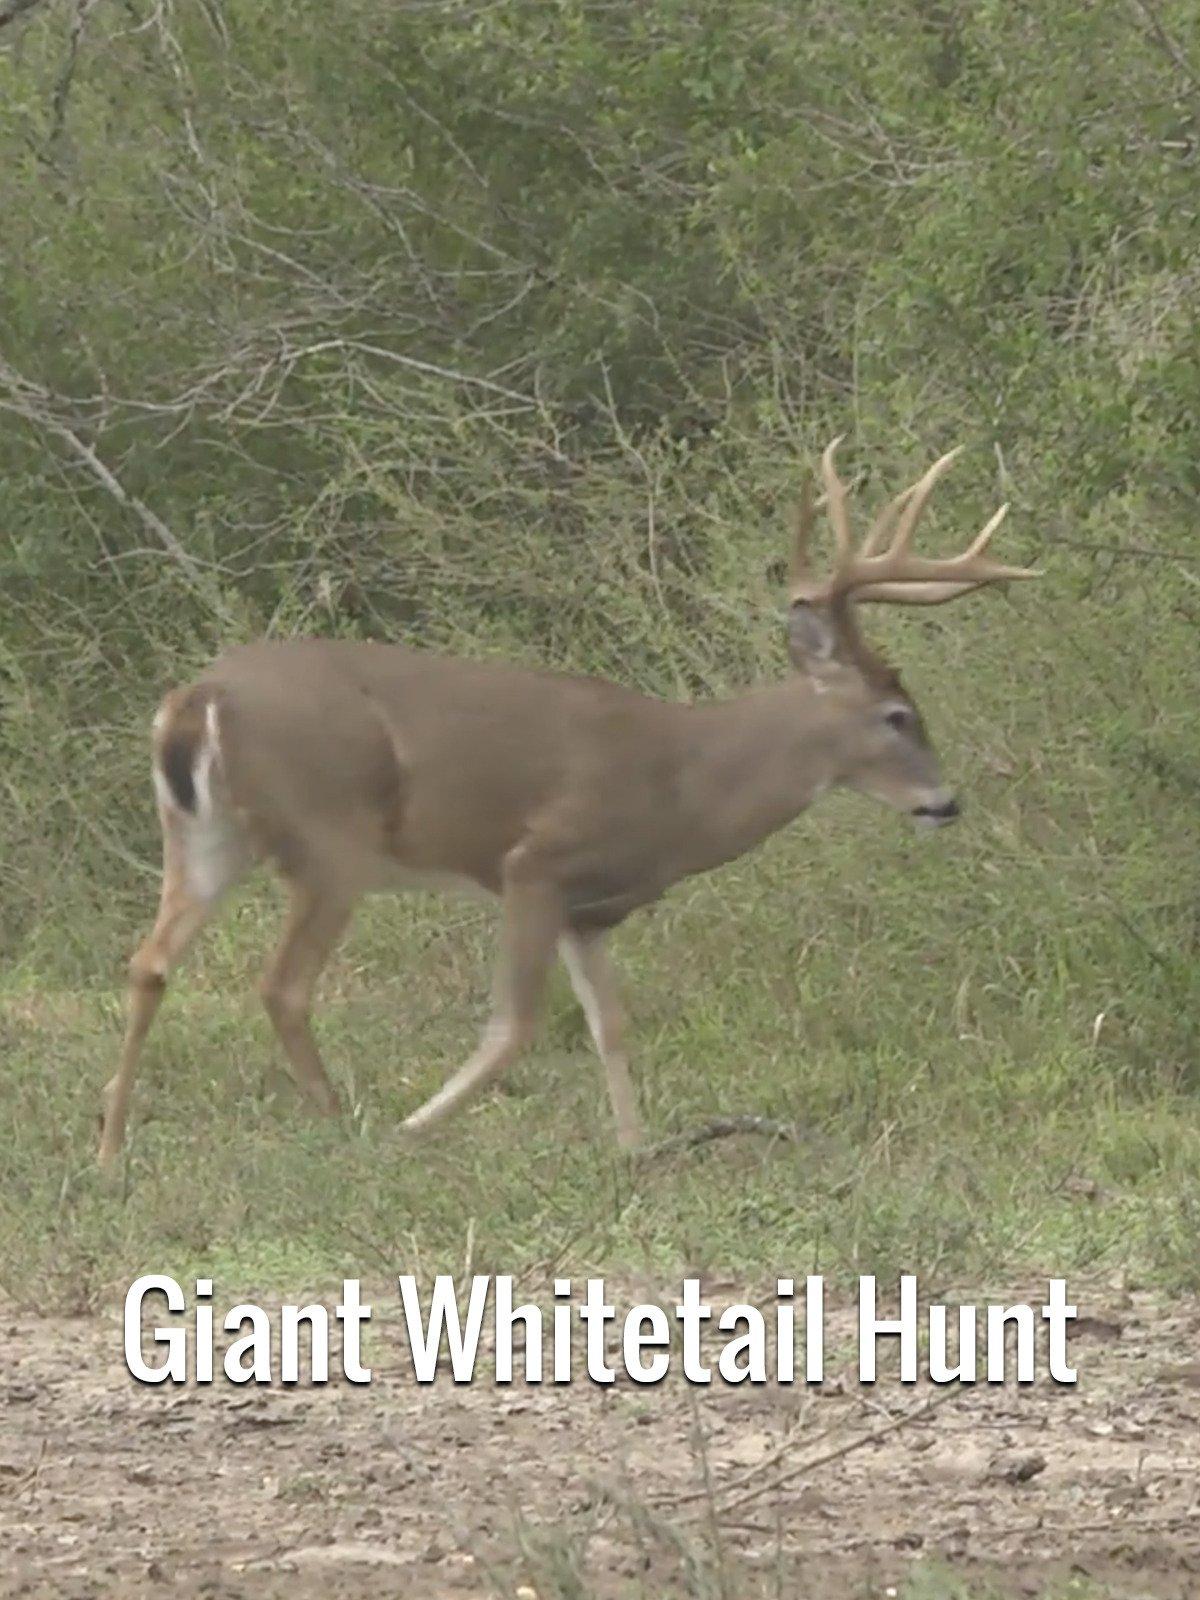 Giant Whitetail Hunt